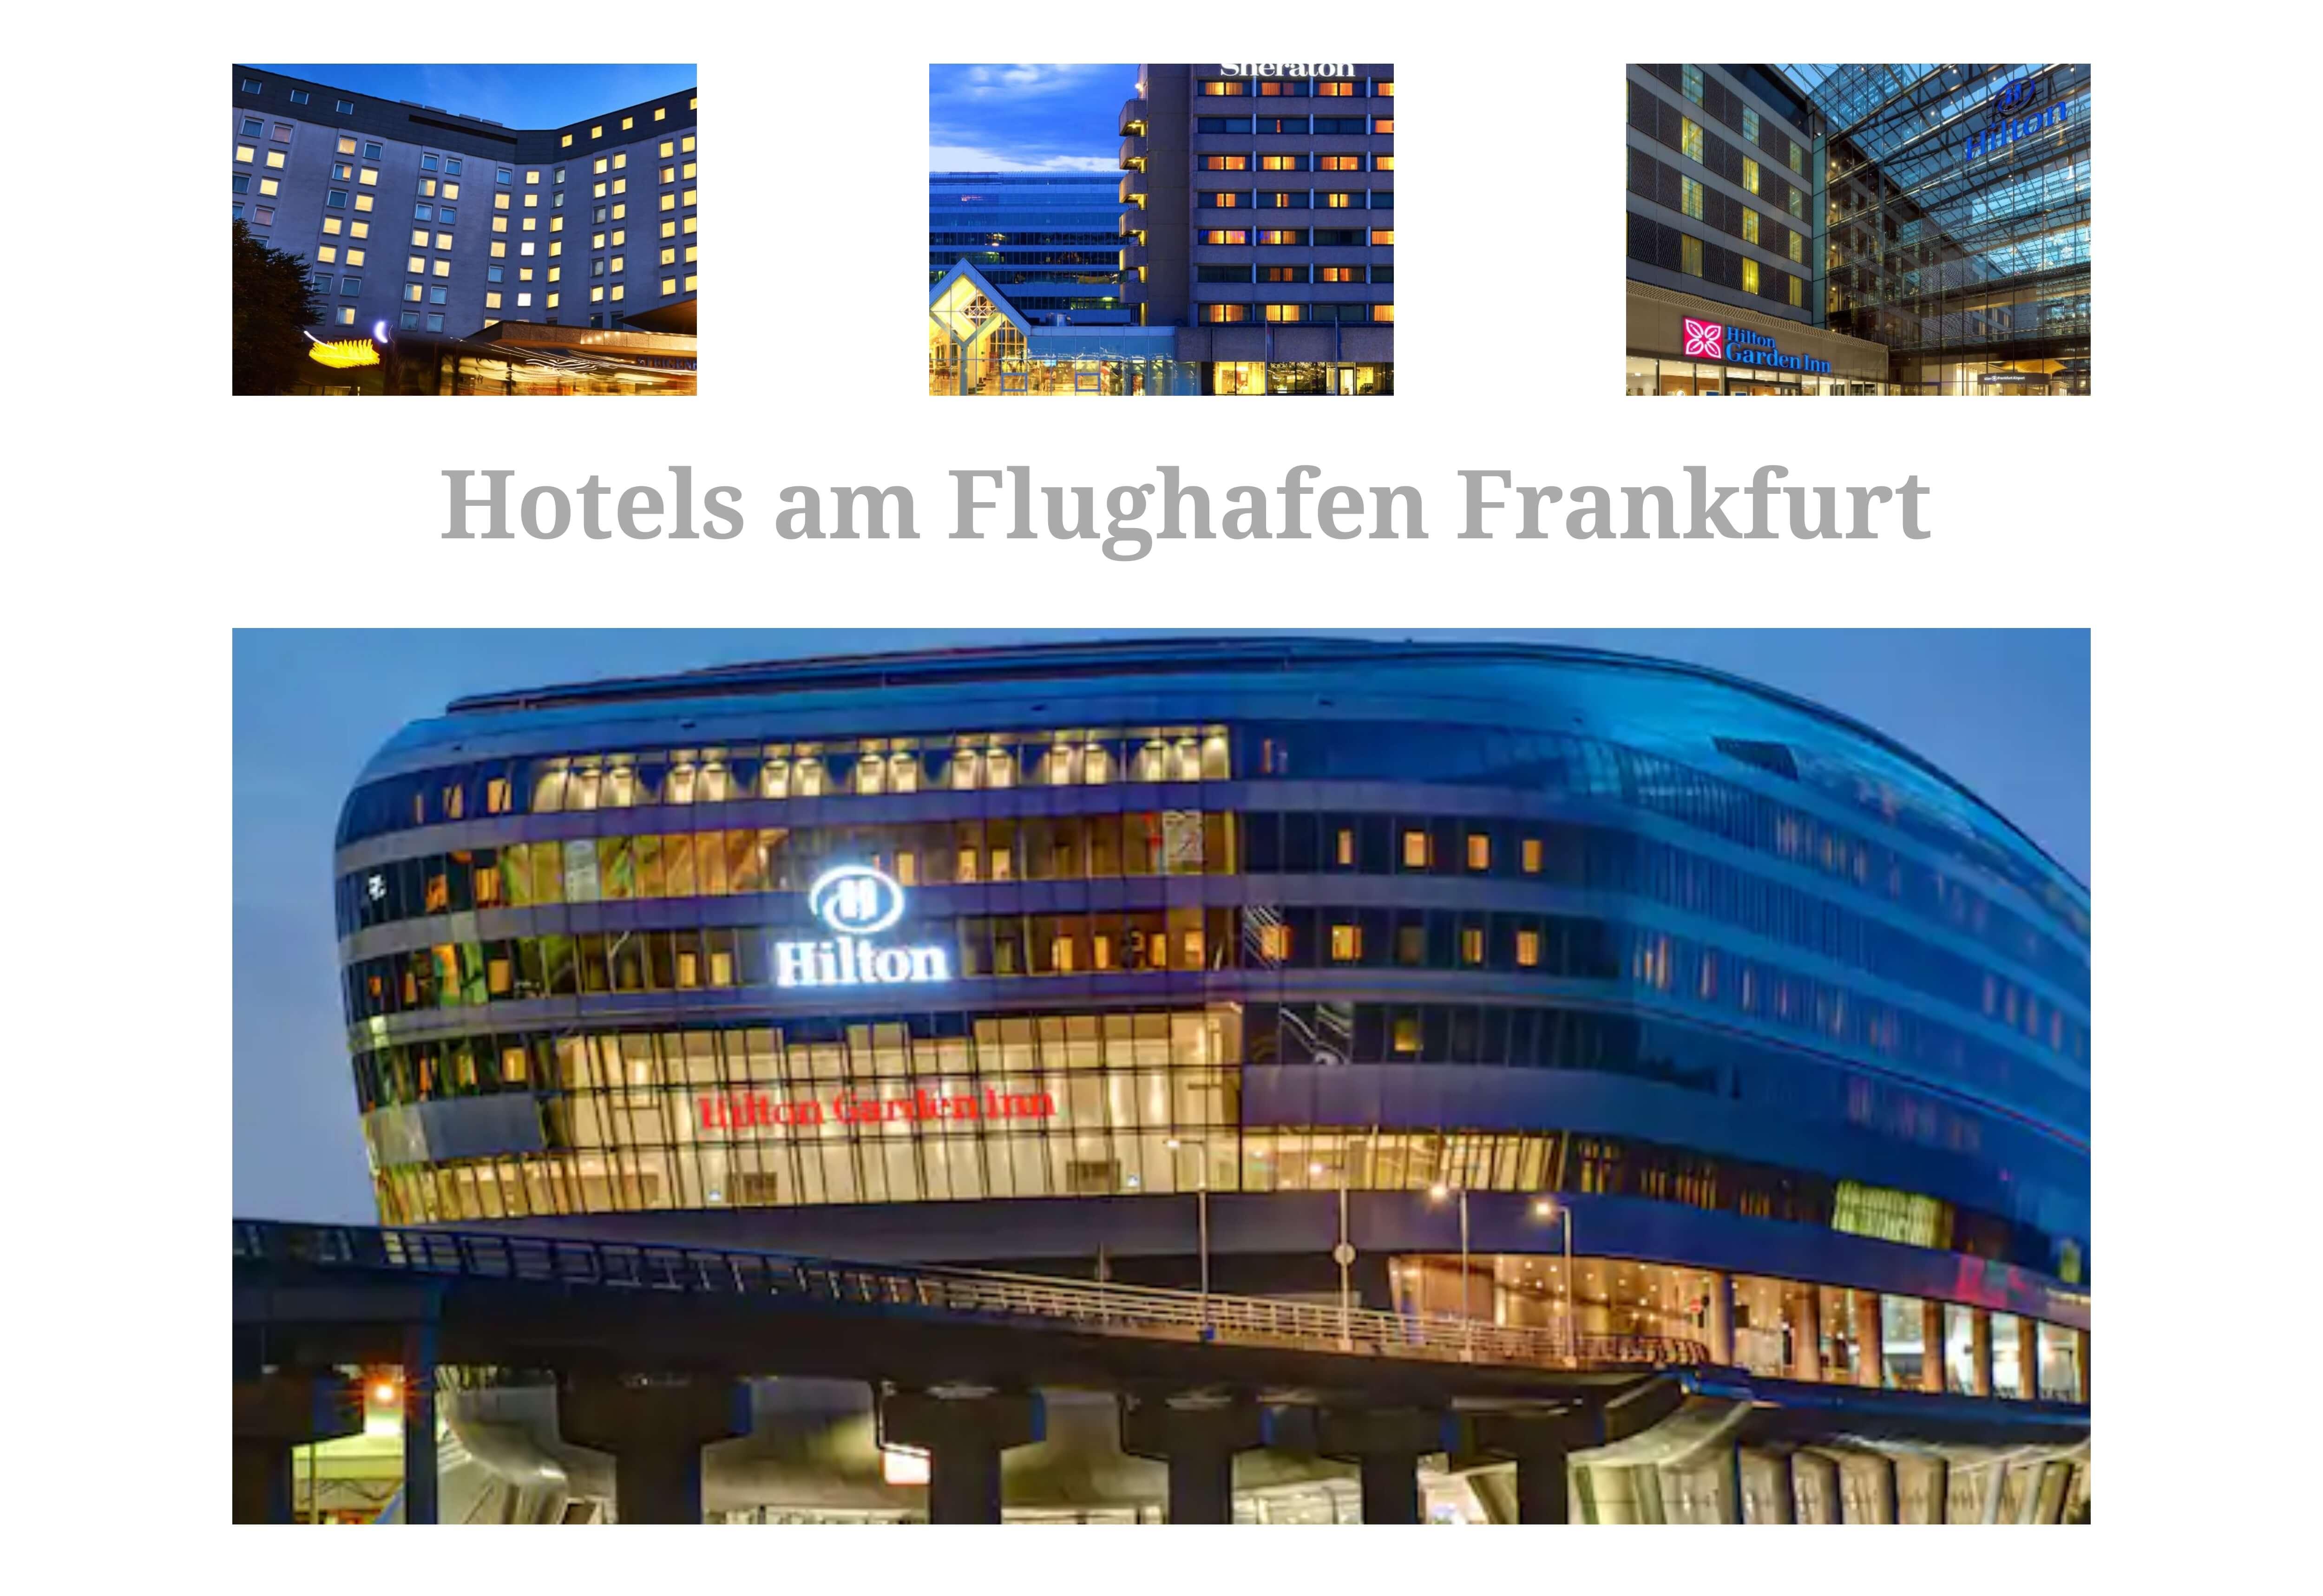 Hotels am Flughafen Frankfurt Airport